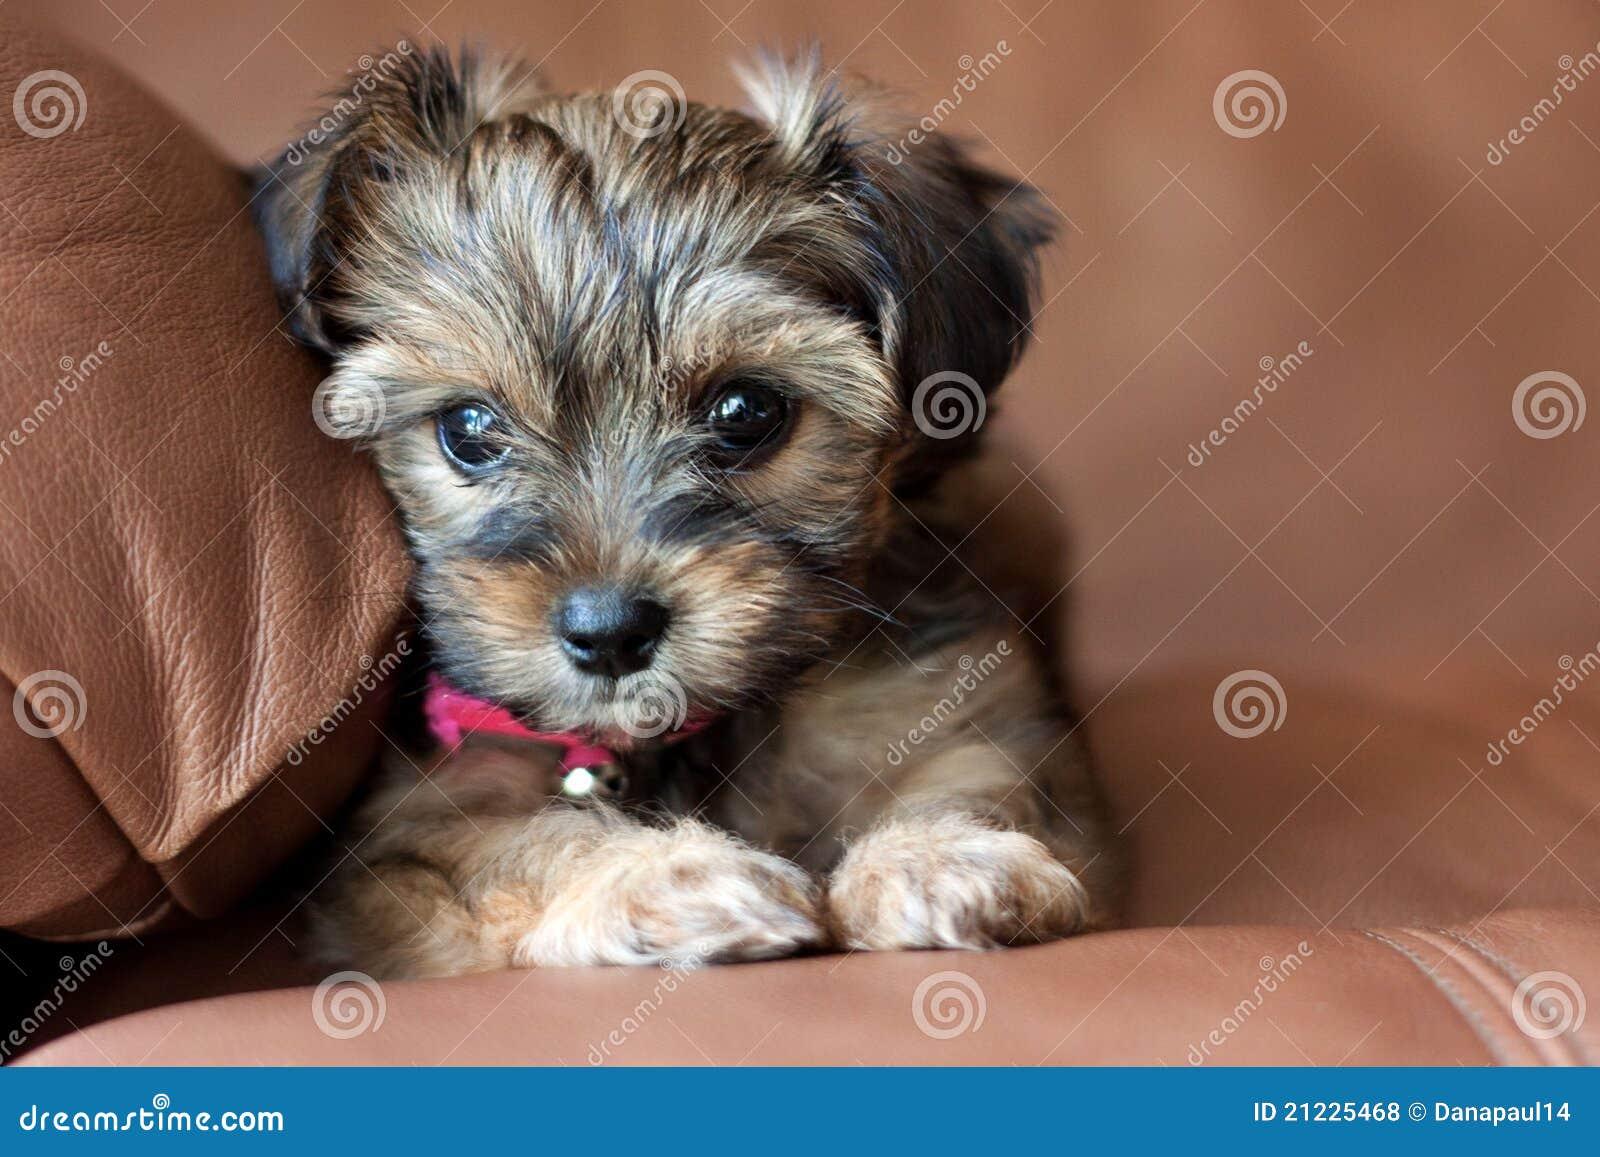 A Yorkie Shih Tzu Mixed Puppy Stock Photo Image Of Pedigree Head